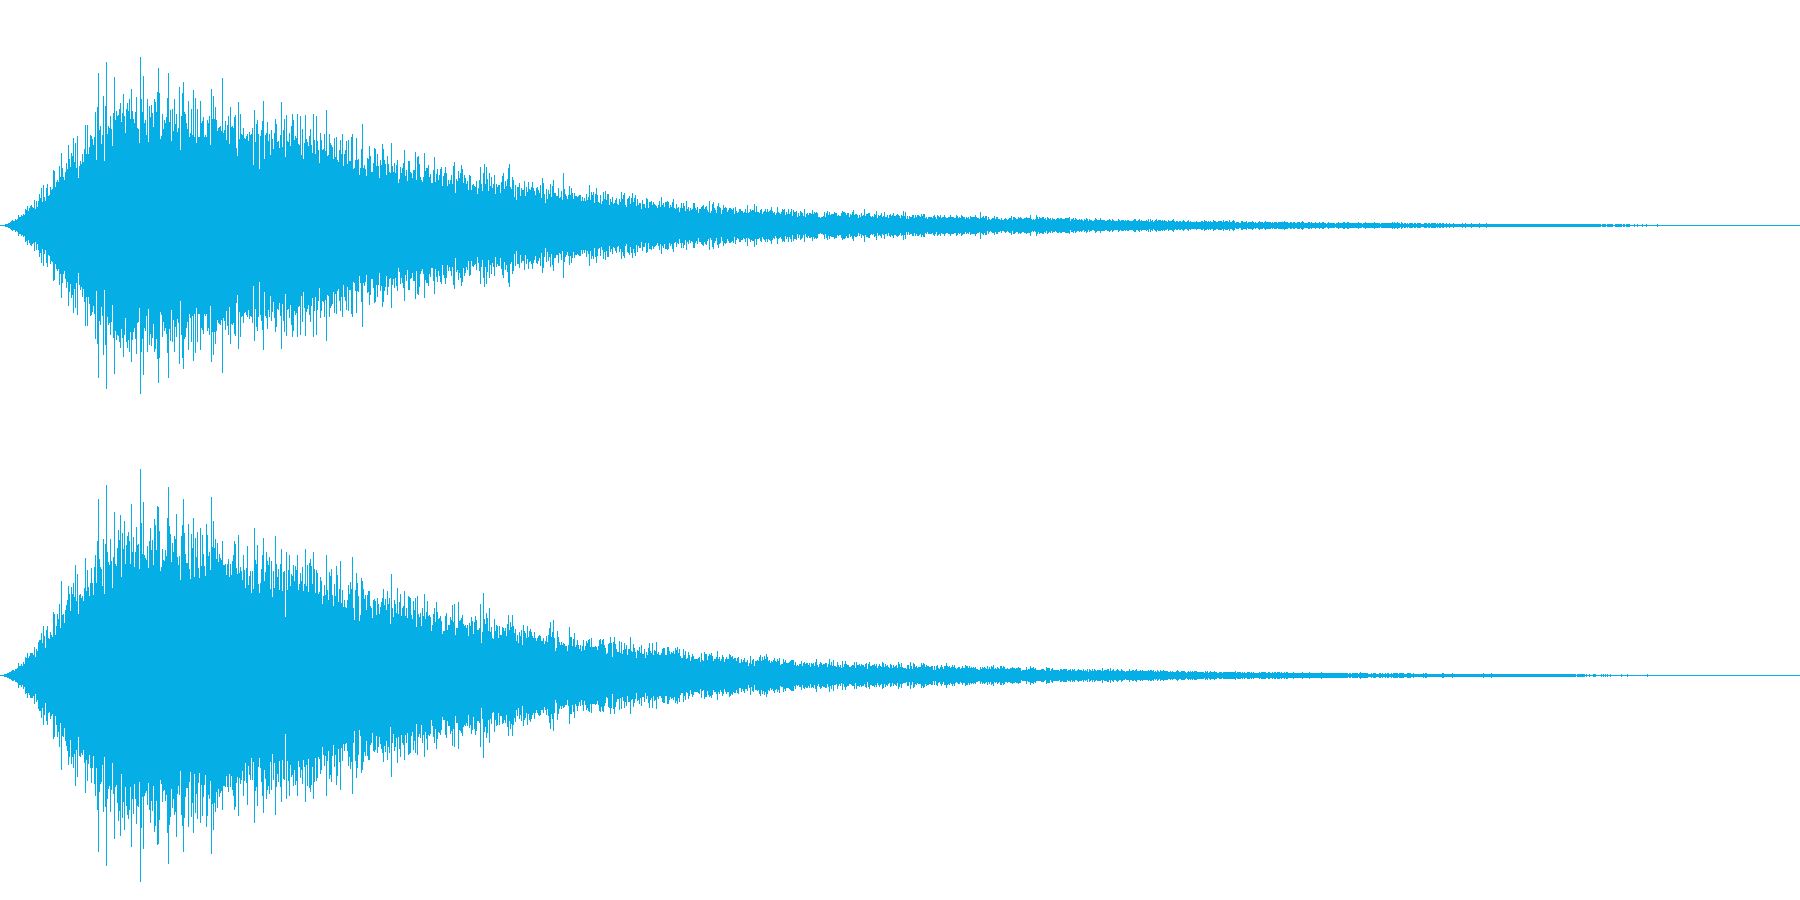 NAMIOTO 波の音 ワンショット音源の再生済みの波形